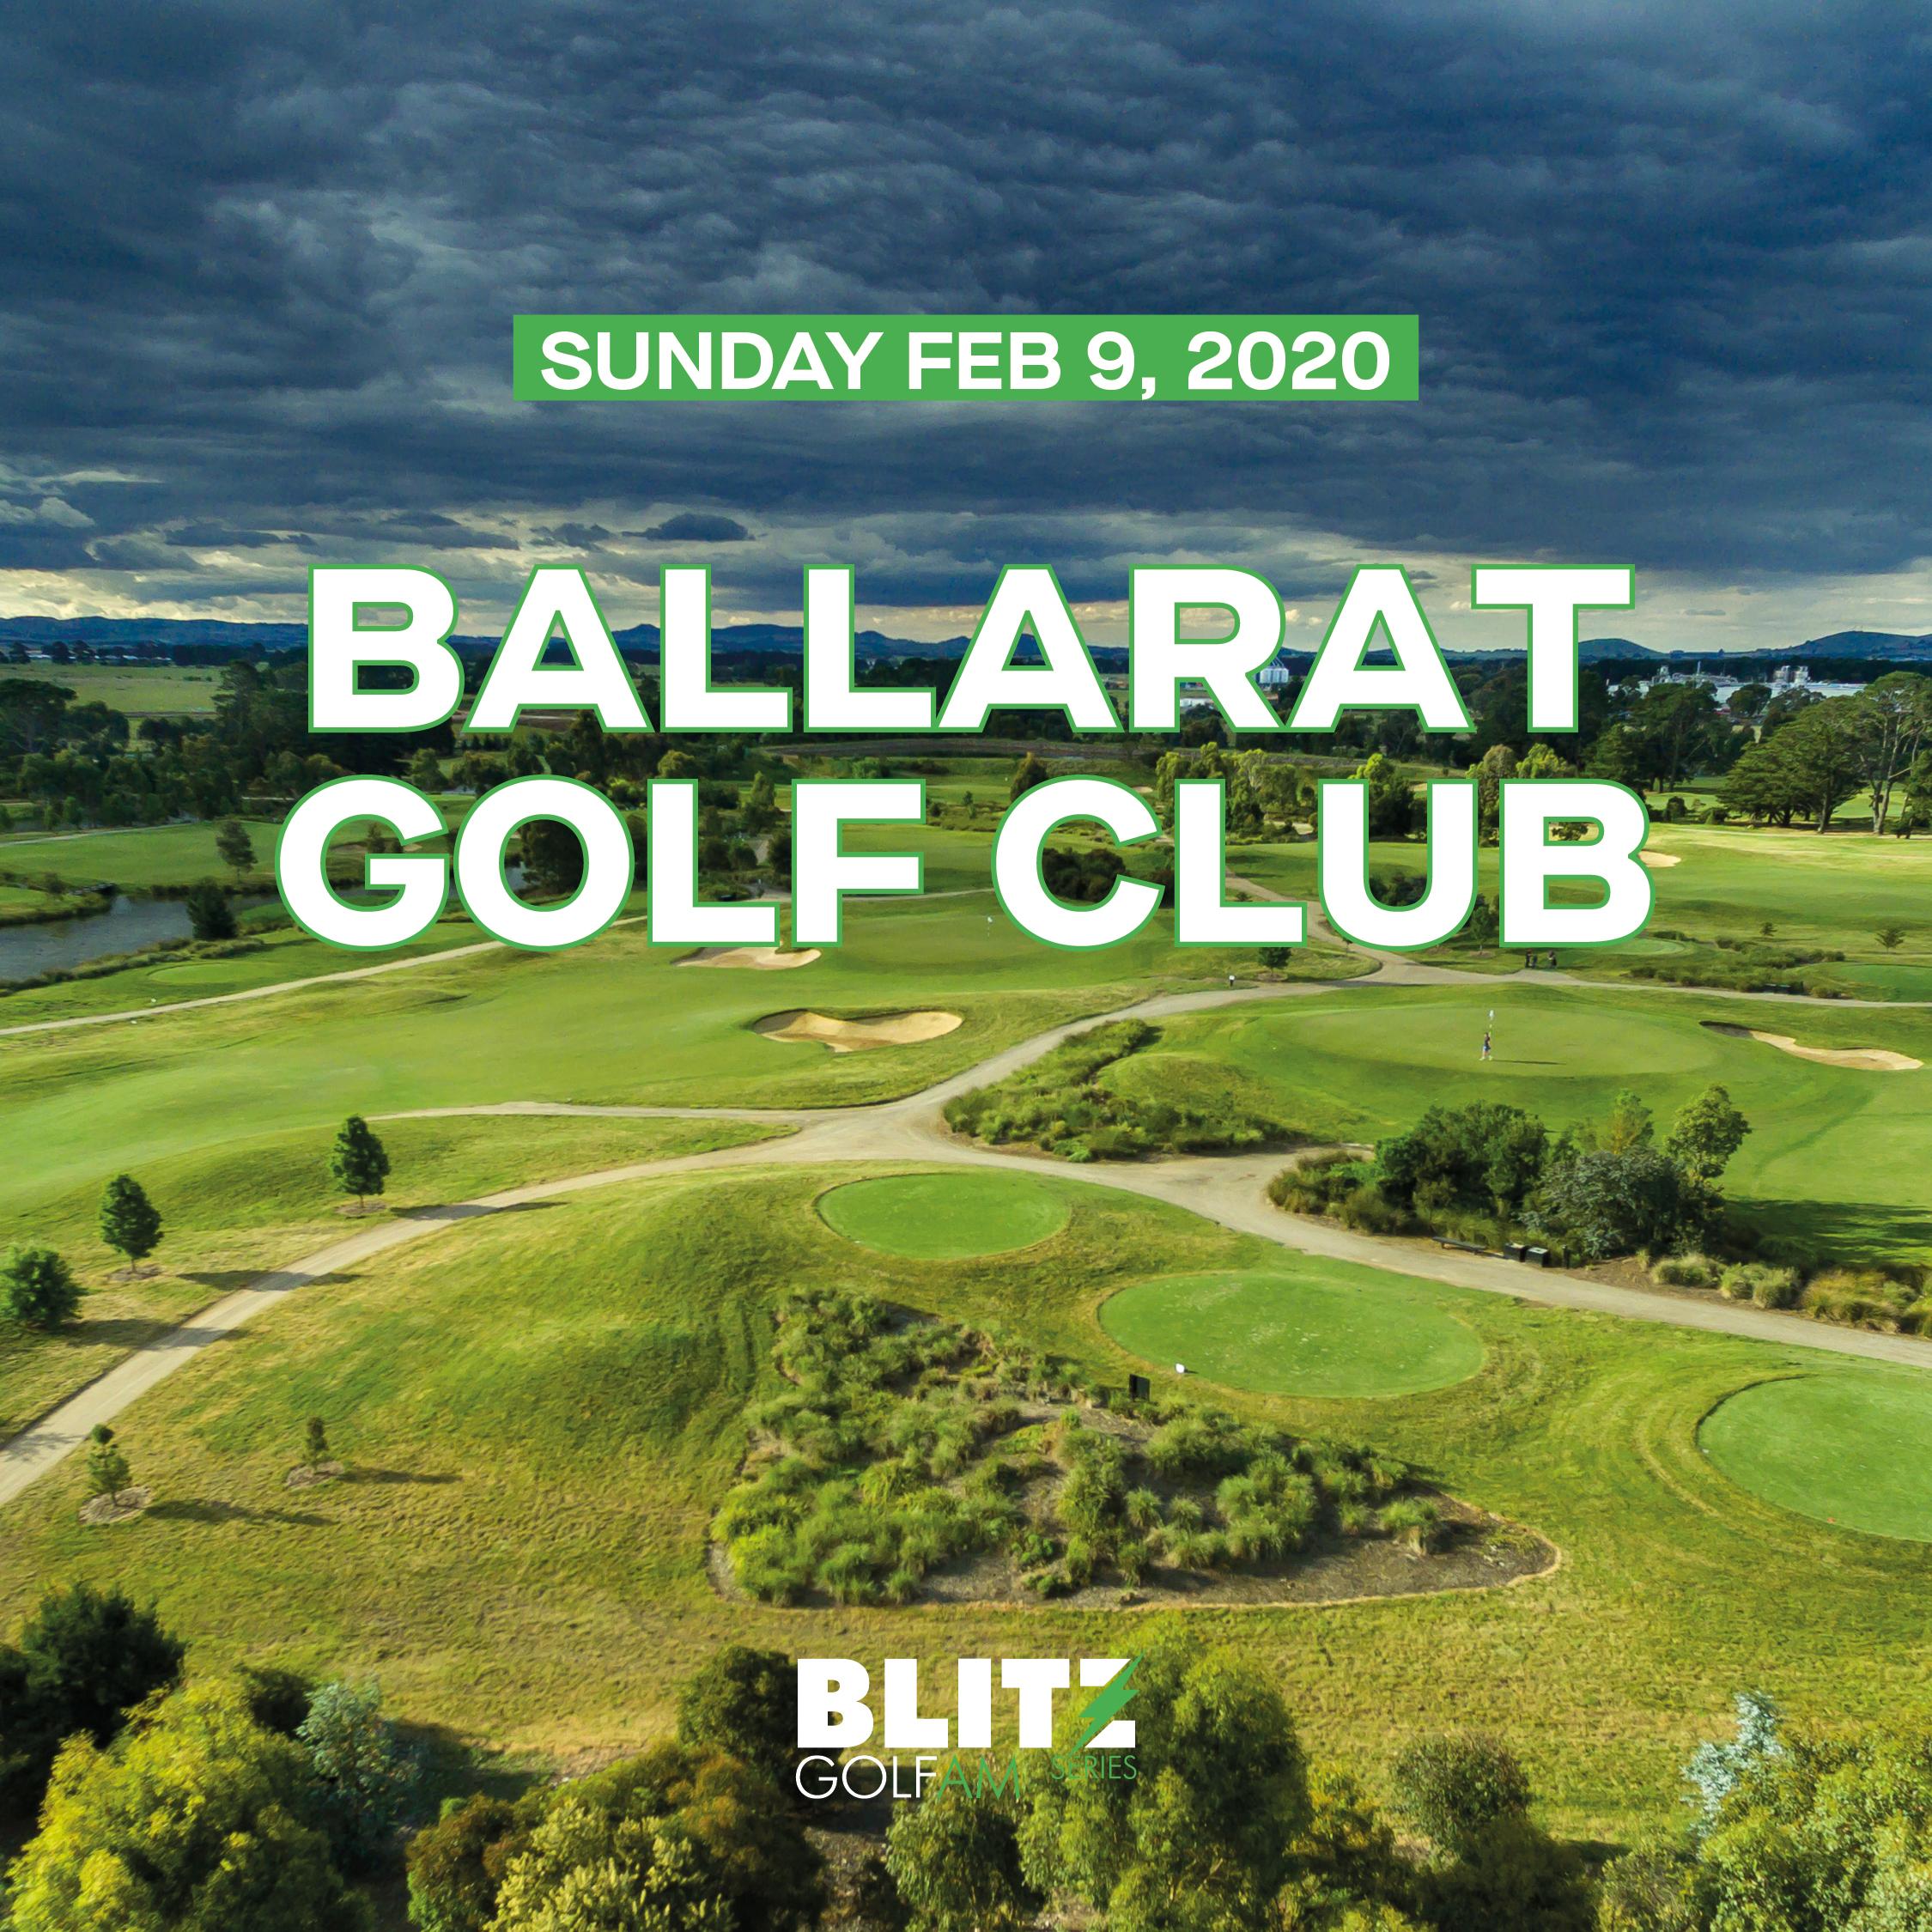 VICTAS_Ballarat_Blitz 2020_AM Series Launch_090220.jpg